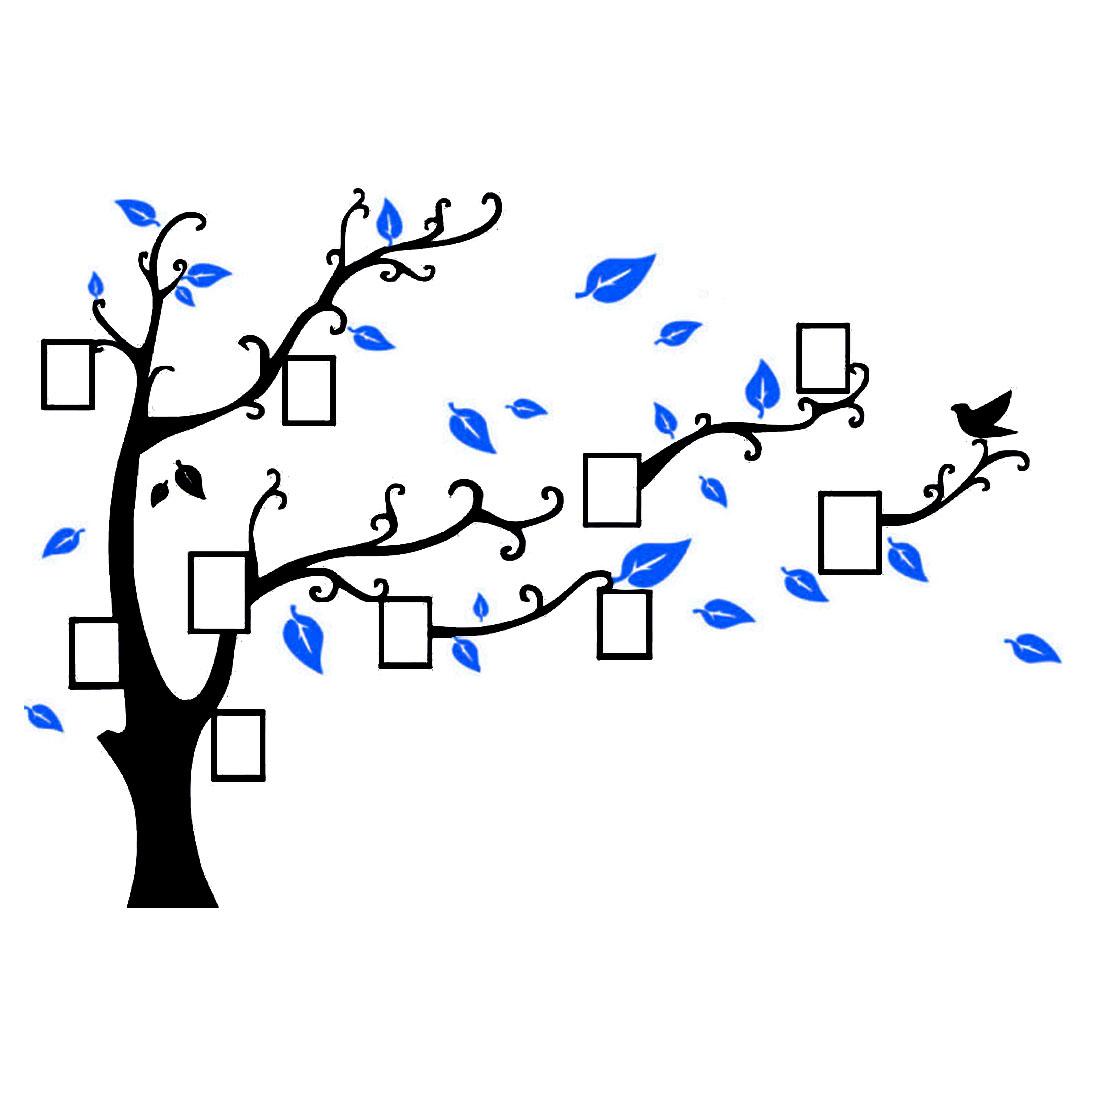 Acrylic Tree Photo Frame Design DIY Self-adhesive 3D Wall Sticker Light Blue